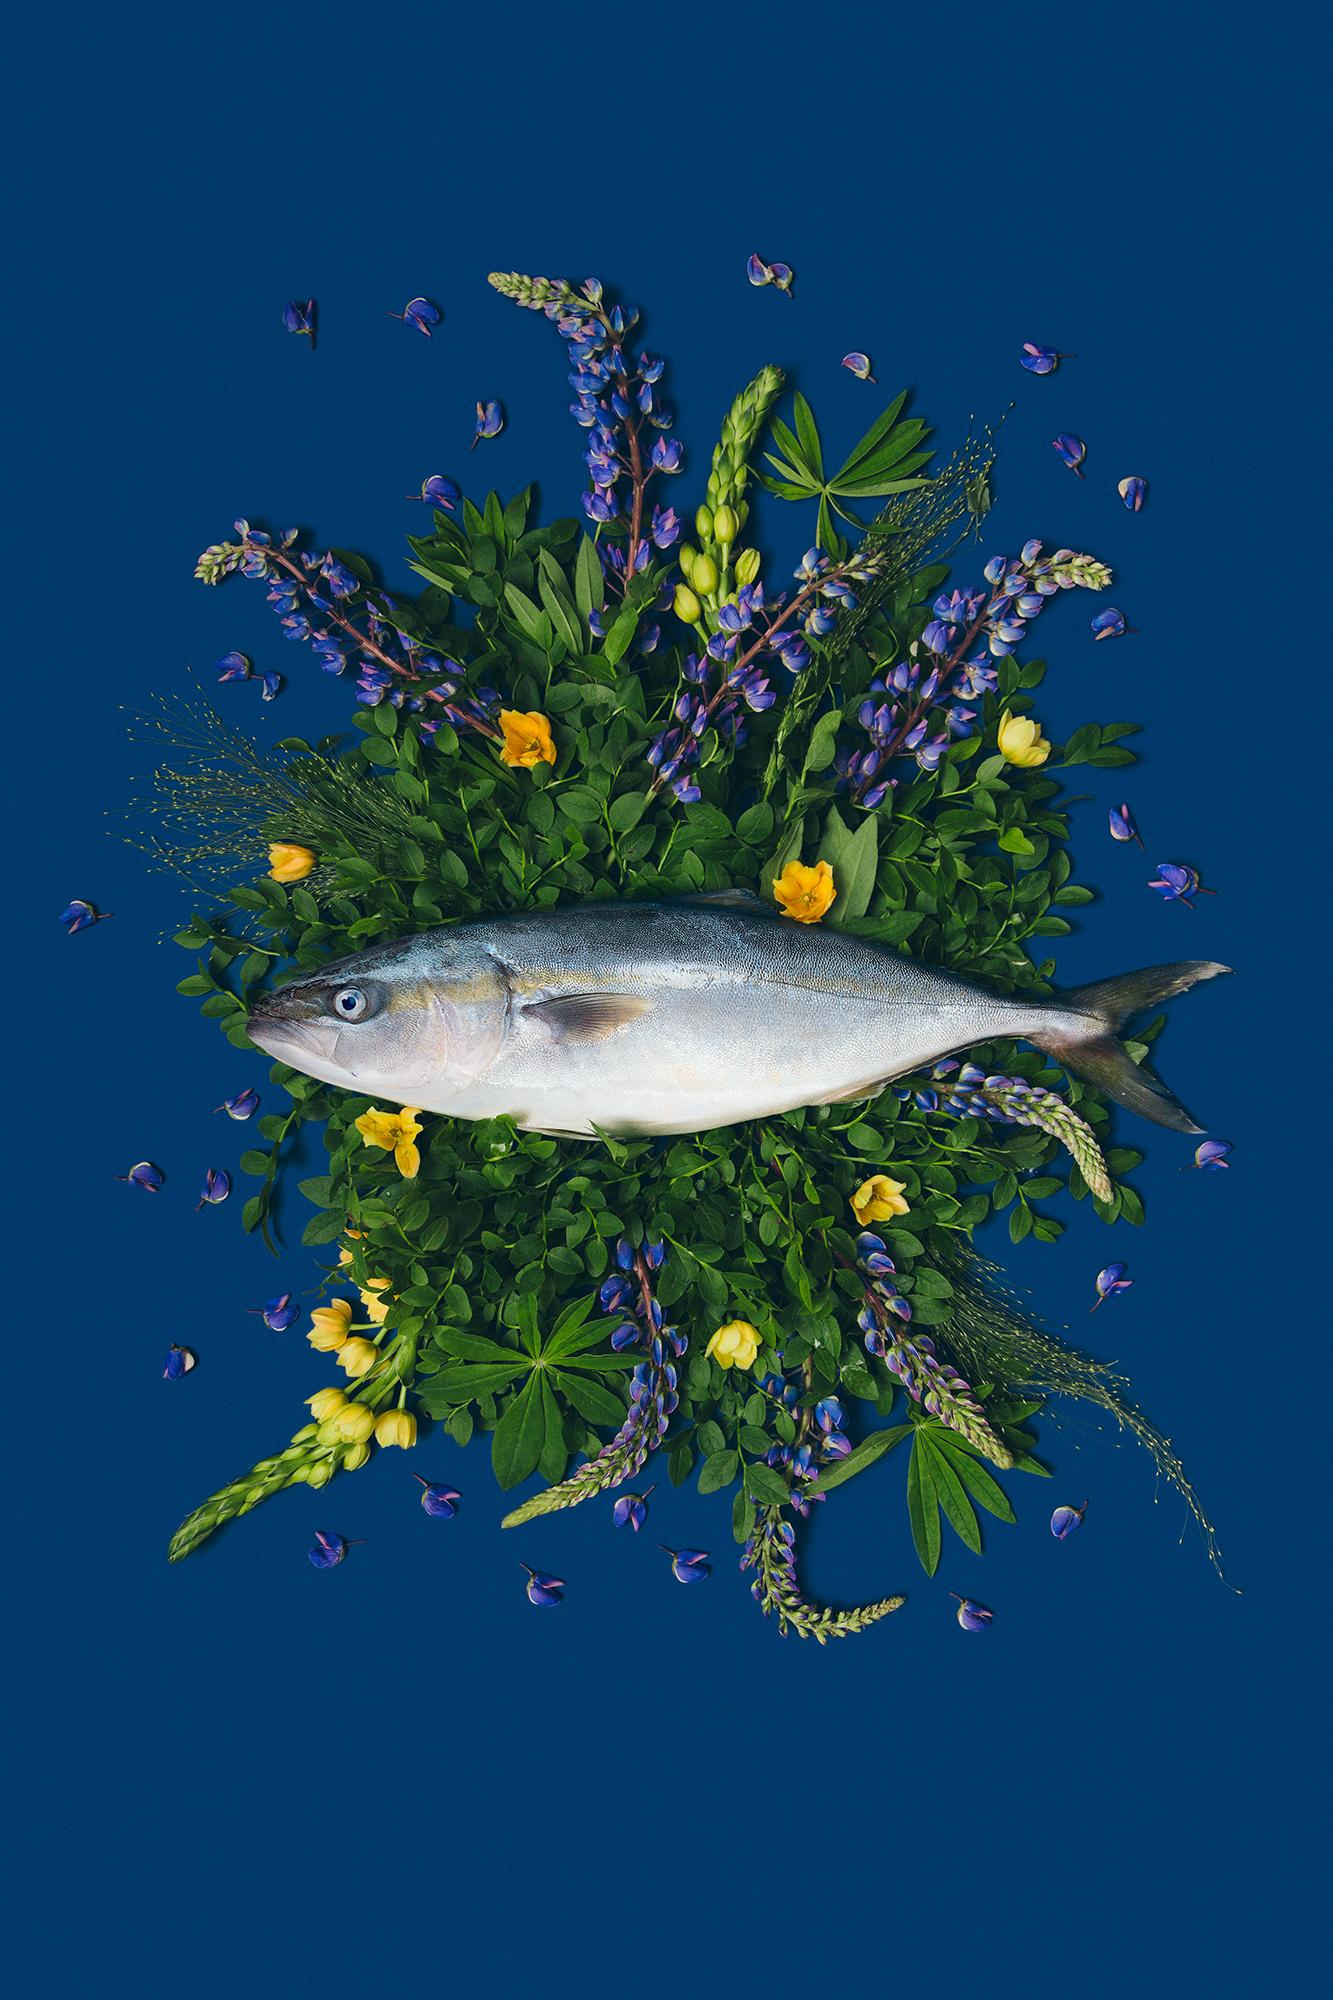 Fish&Flowers / фото Юлия Потато